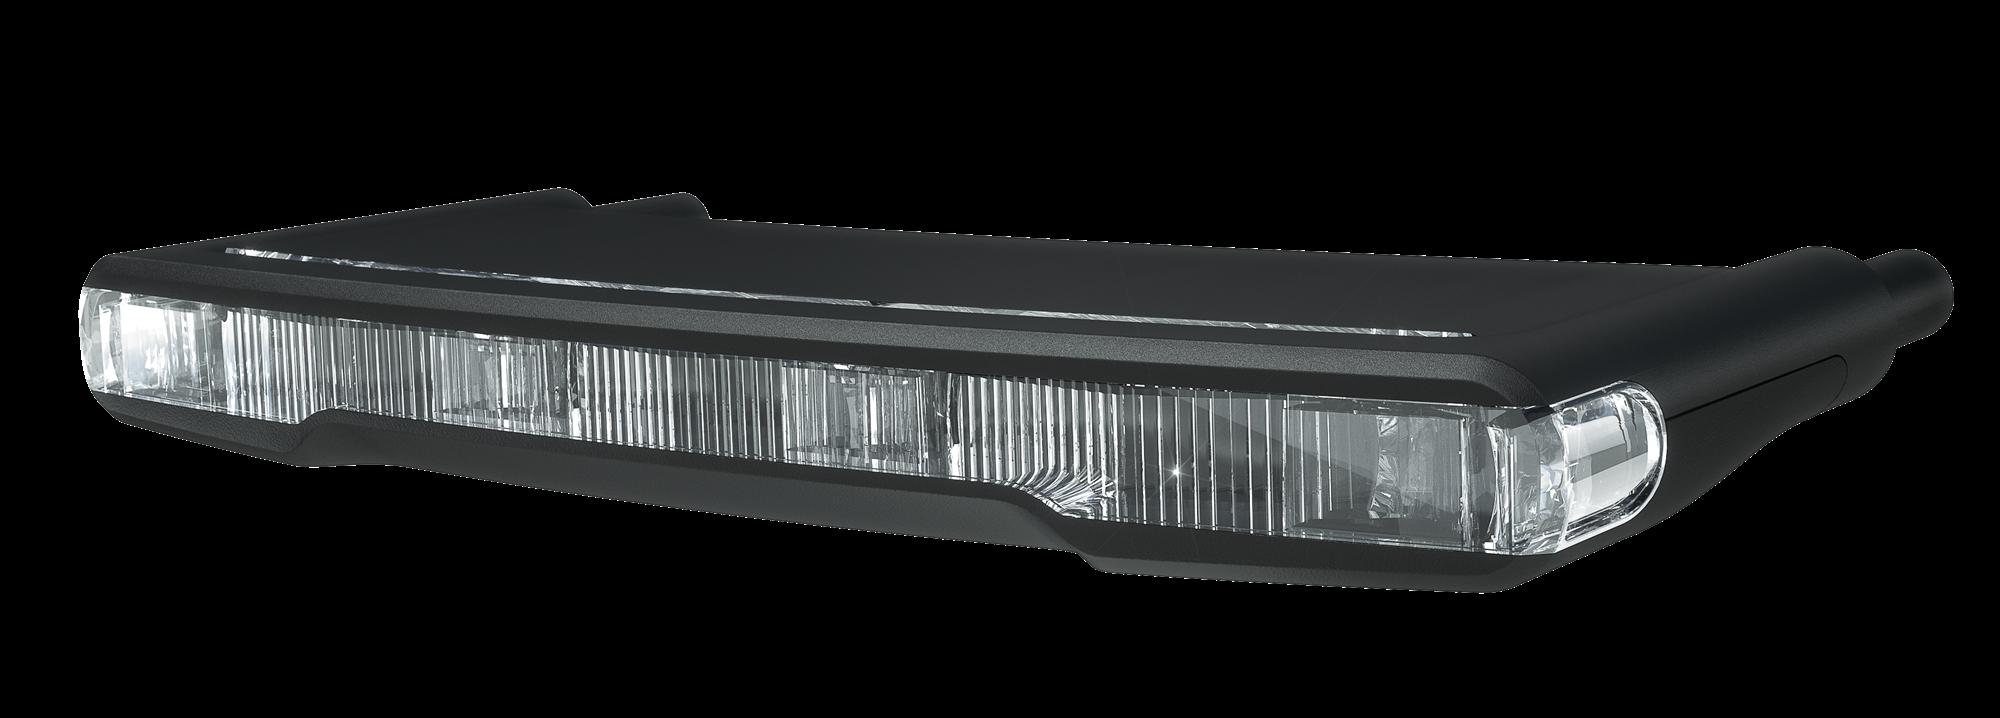 H-CARGO E-BIKE 6-12V